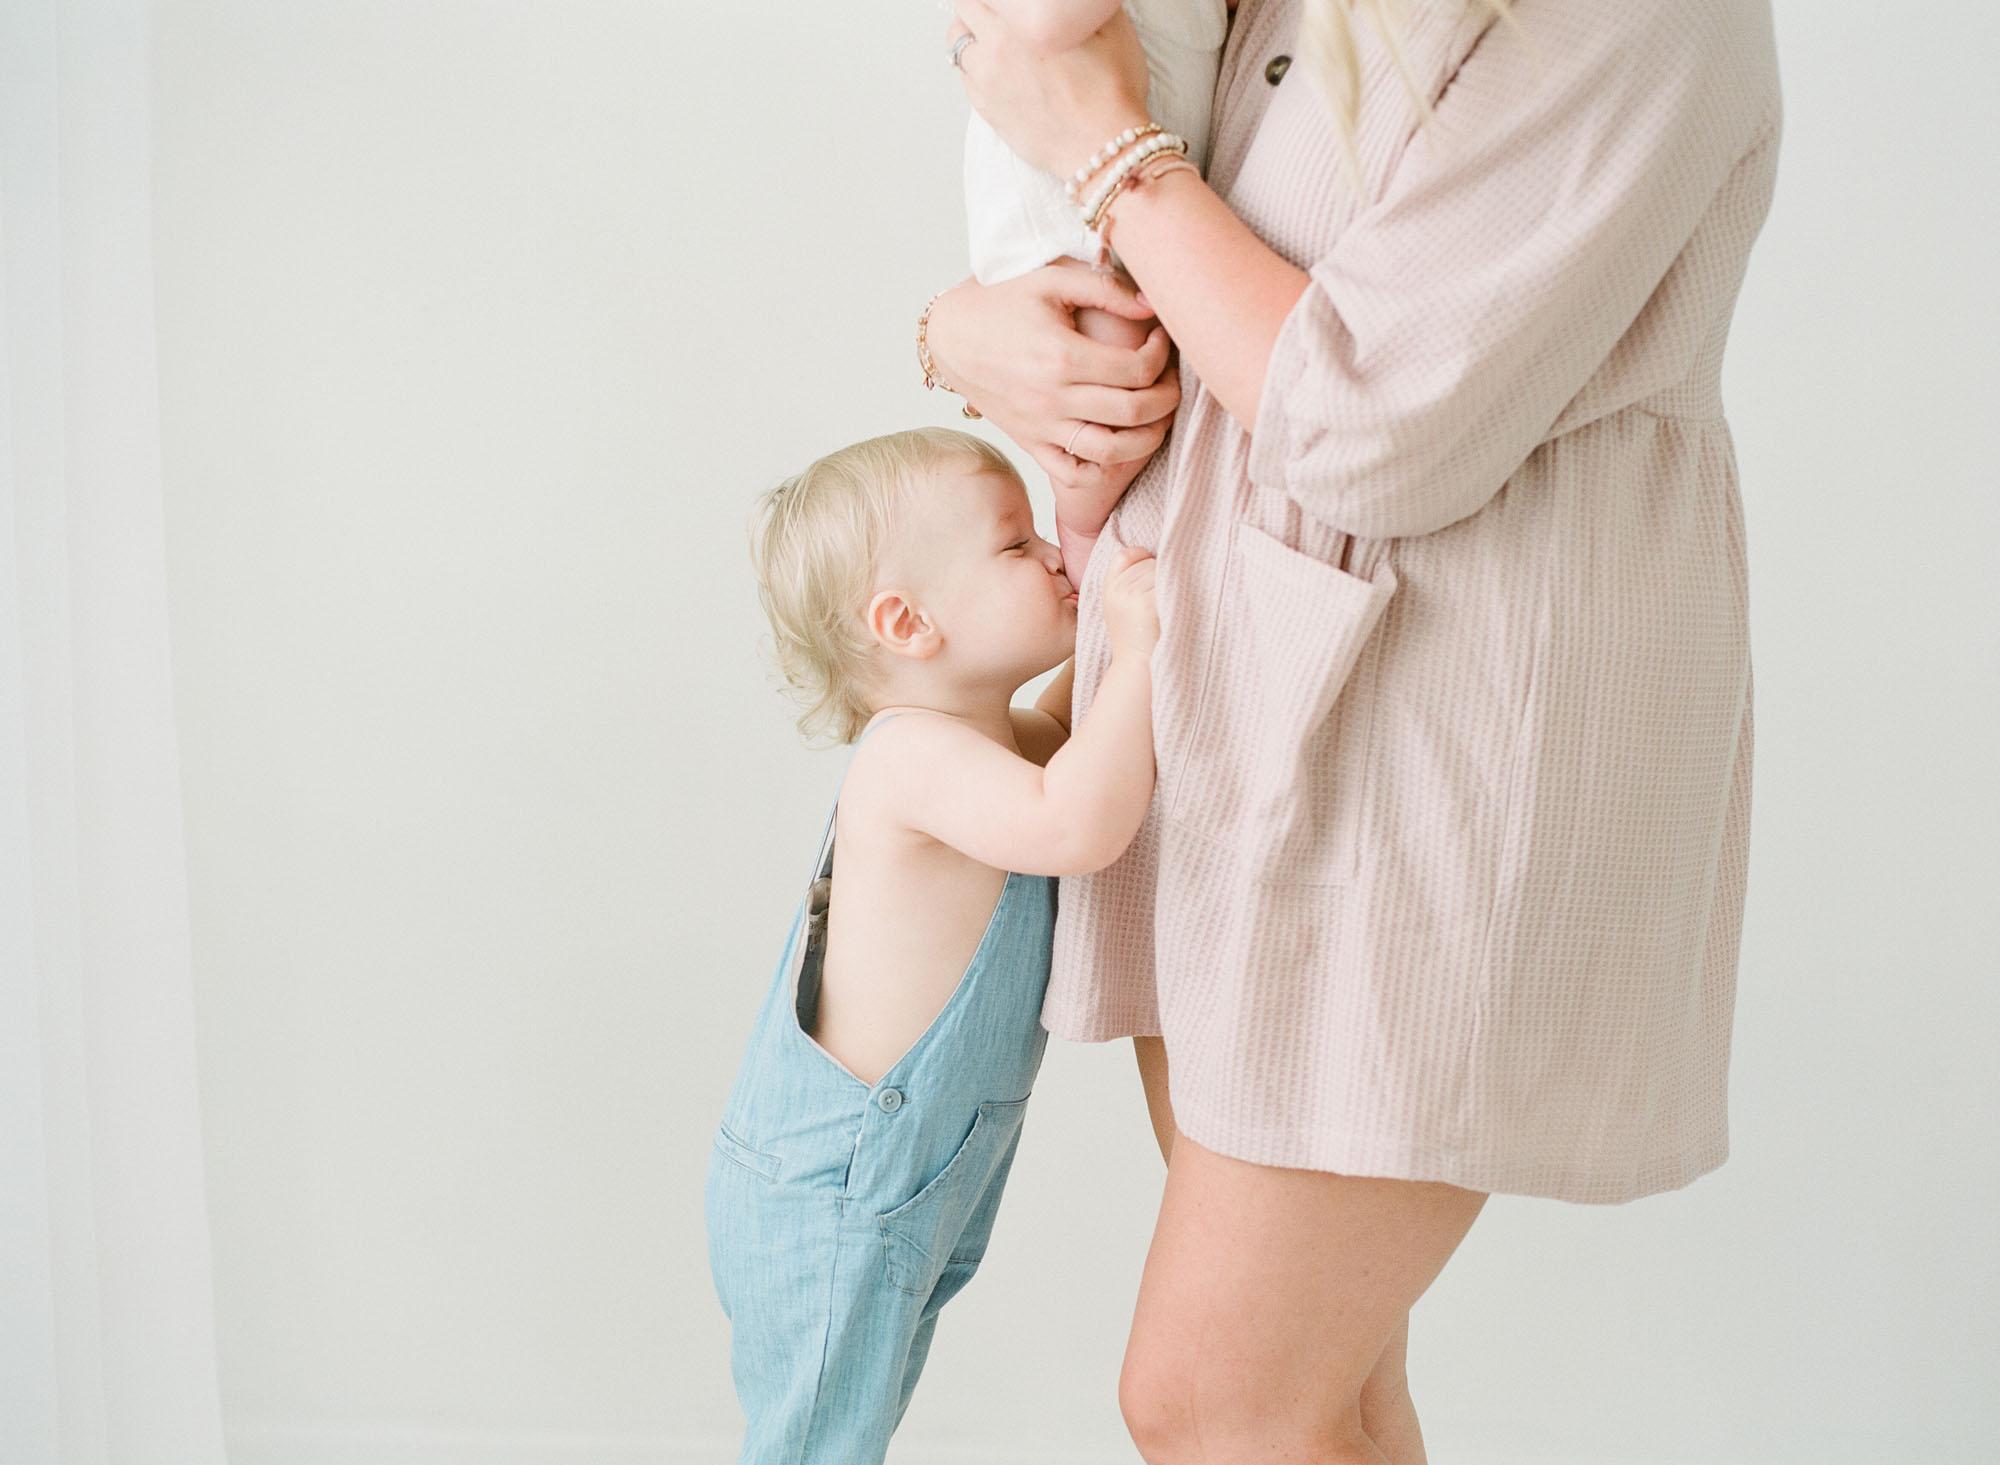 wake-forest-family-photographer-studio-session-motherhood-006